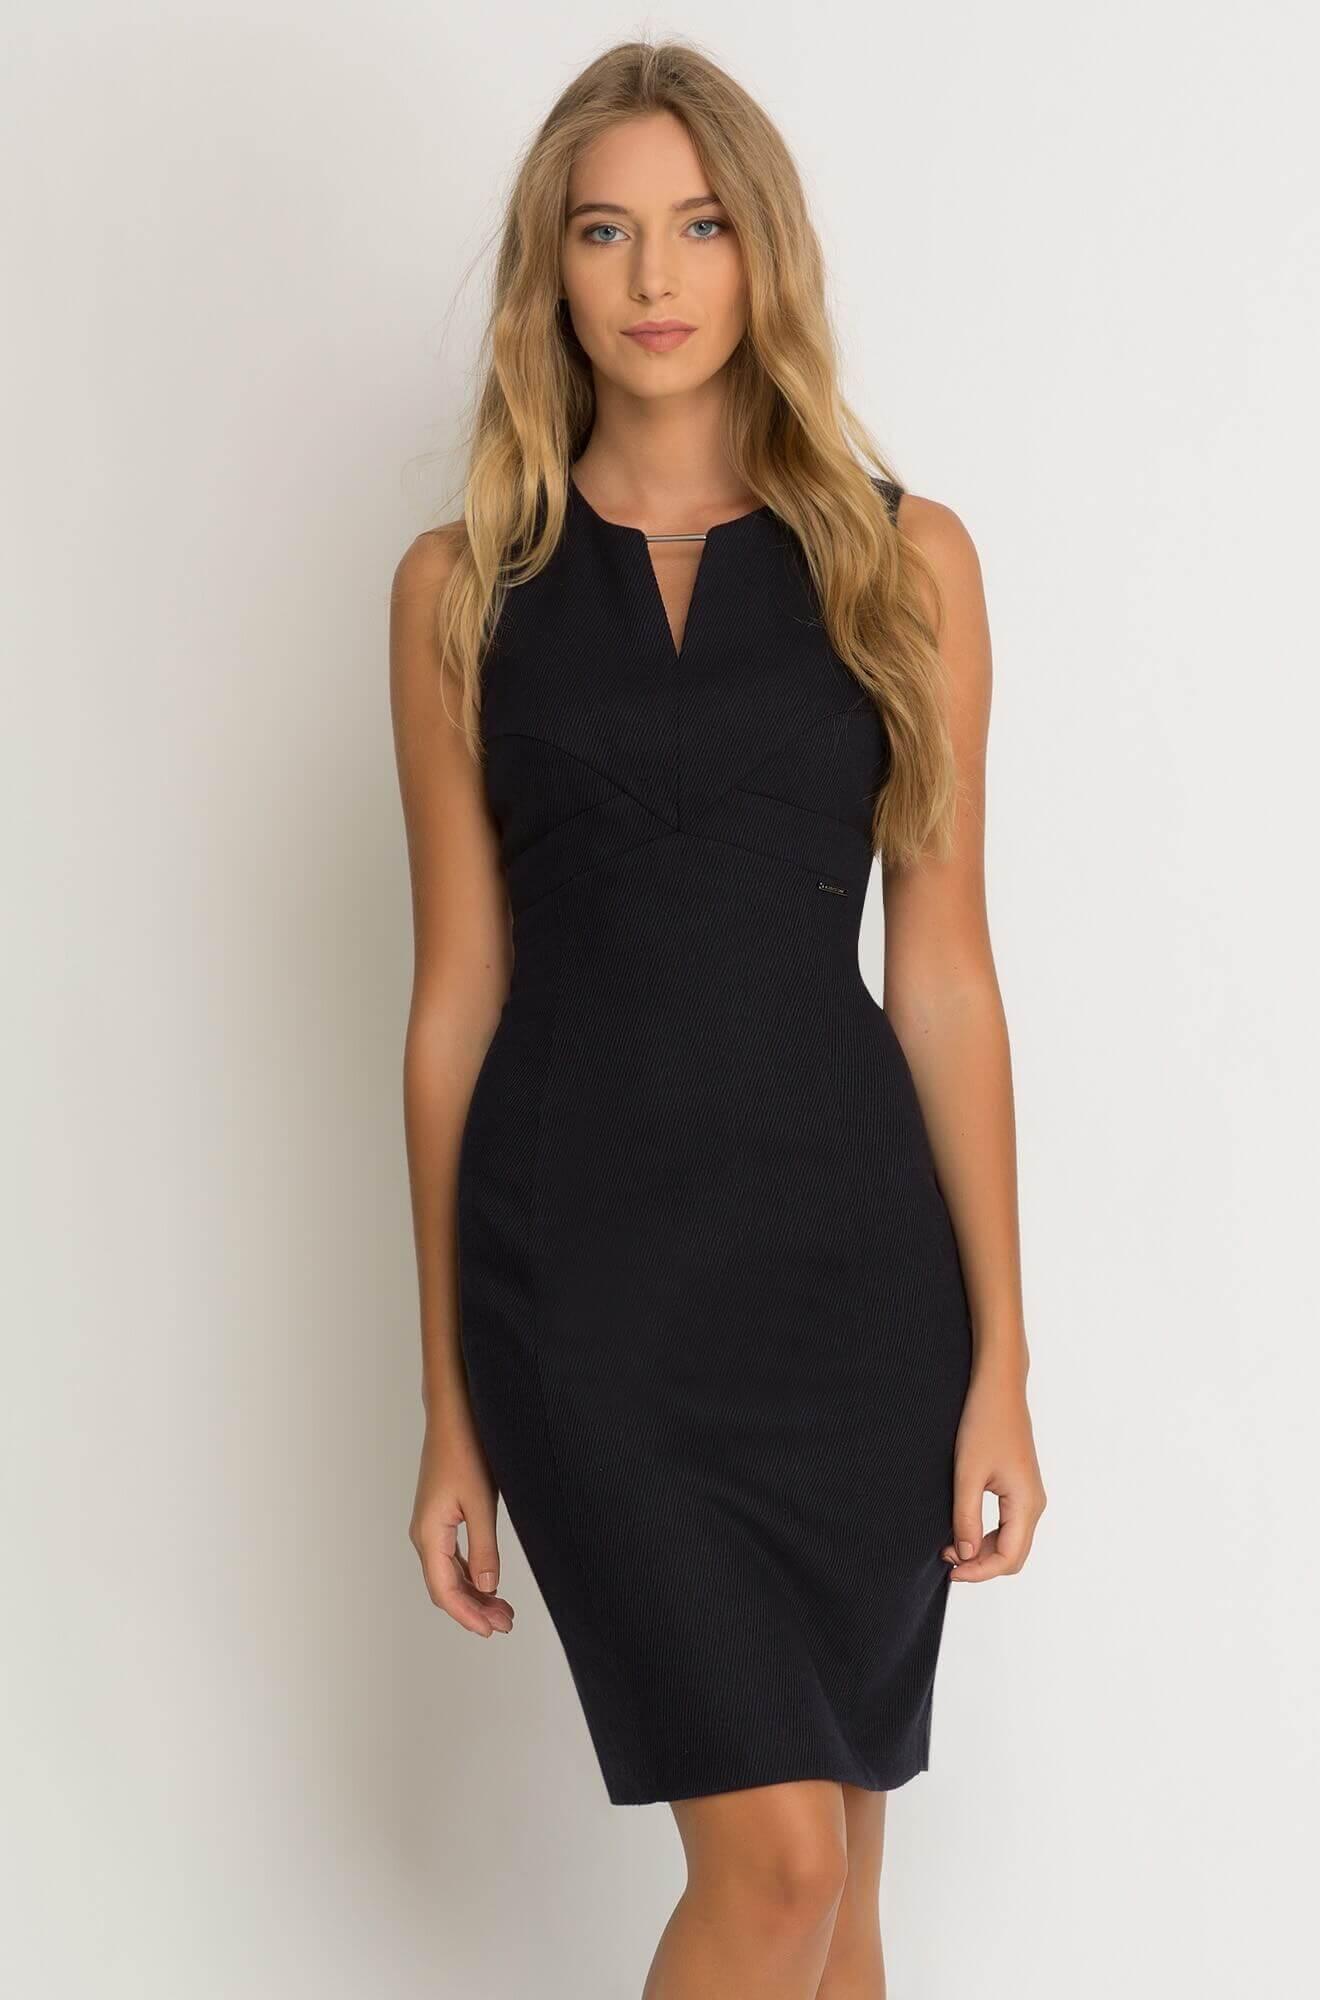 Orsay promocje sukienki fakt